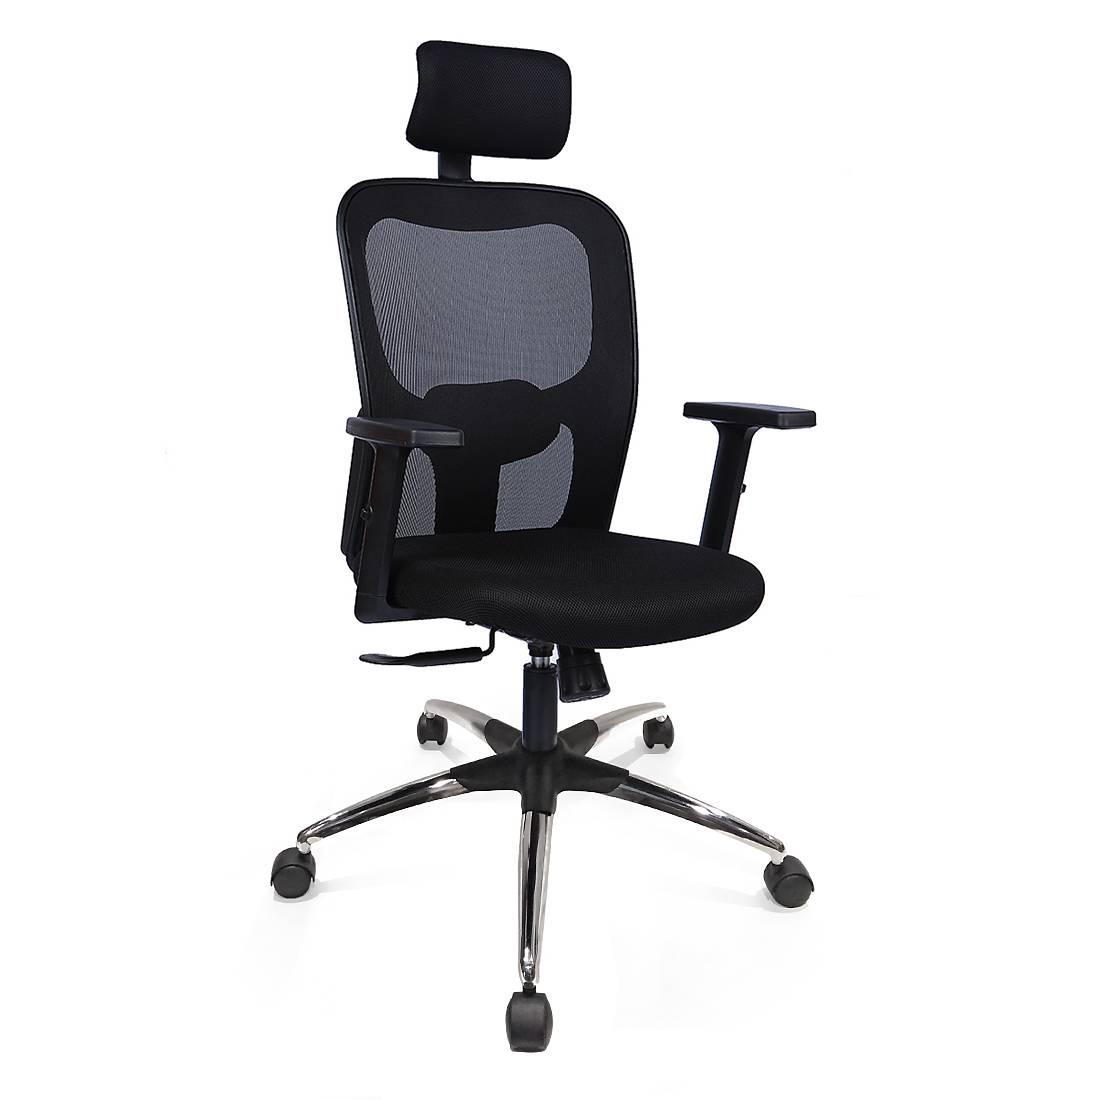 Study Chair: Buy Study Chairs Online [6 Designs] - Urban Ladder